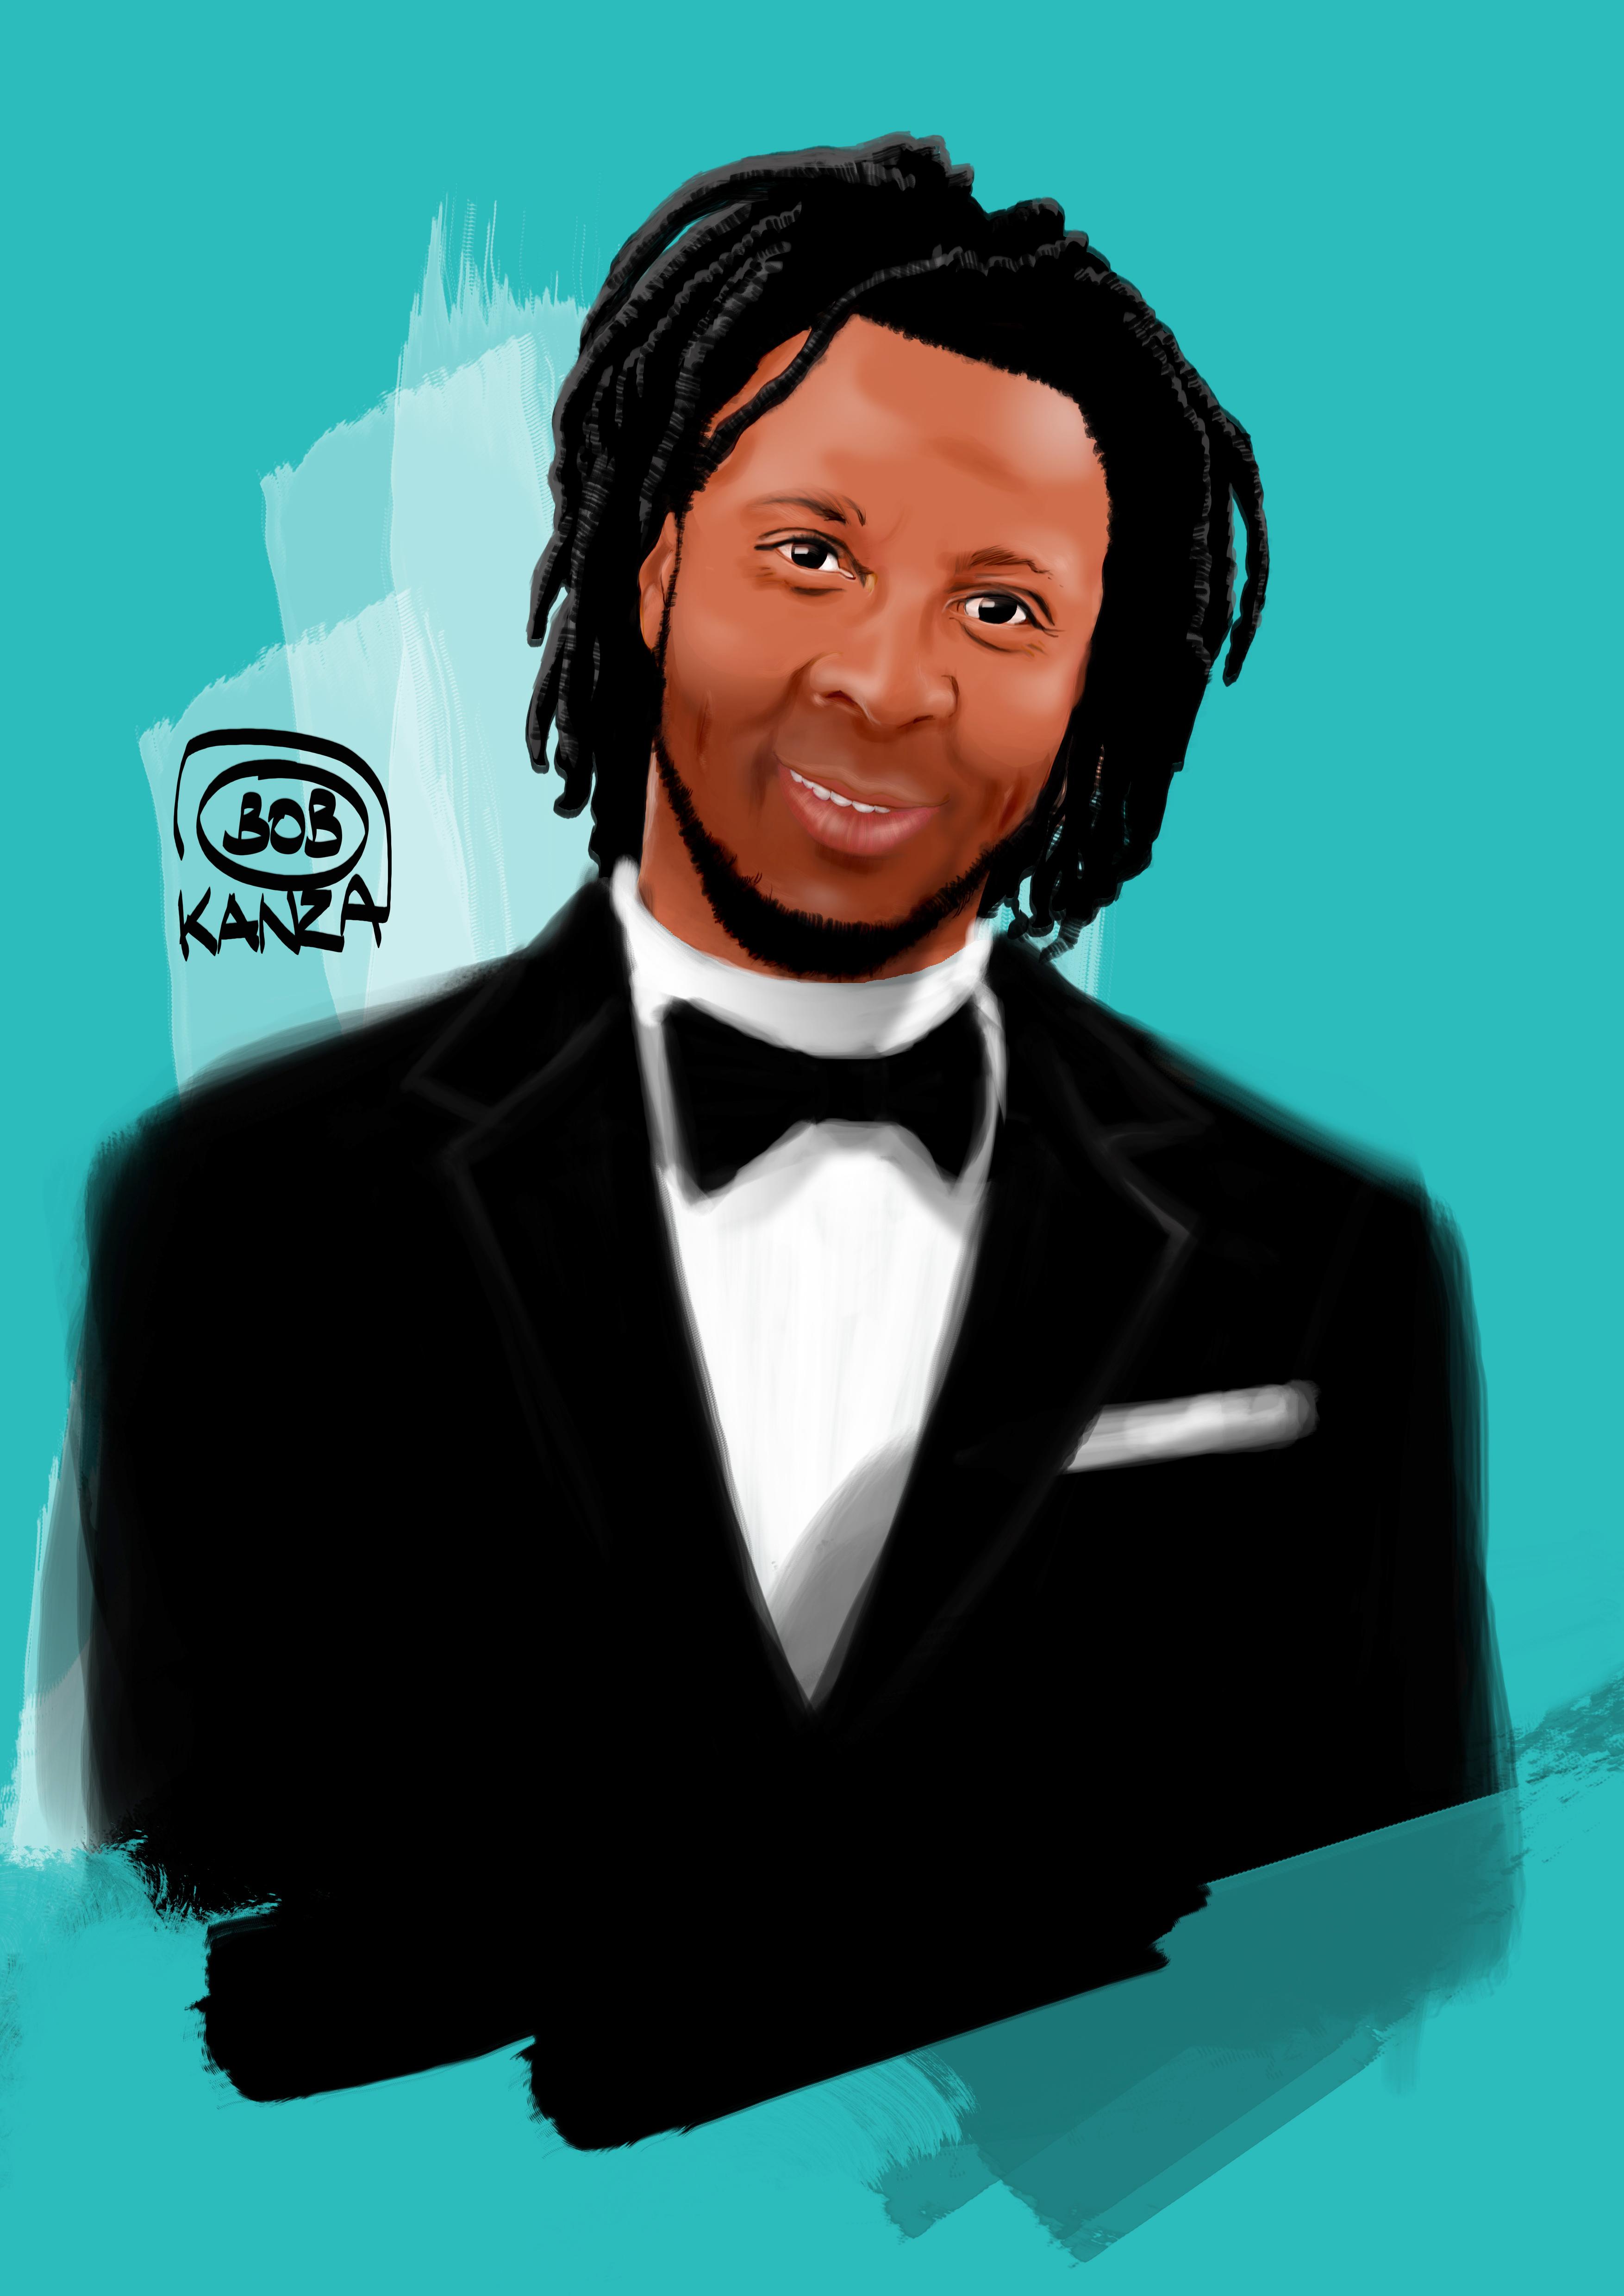 Portrait Digital Art bel homme Africain - Bob Kanza